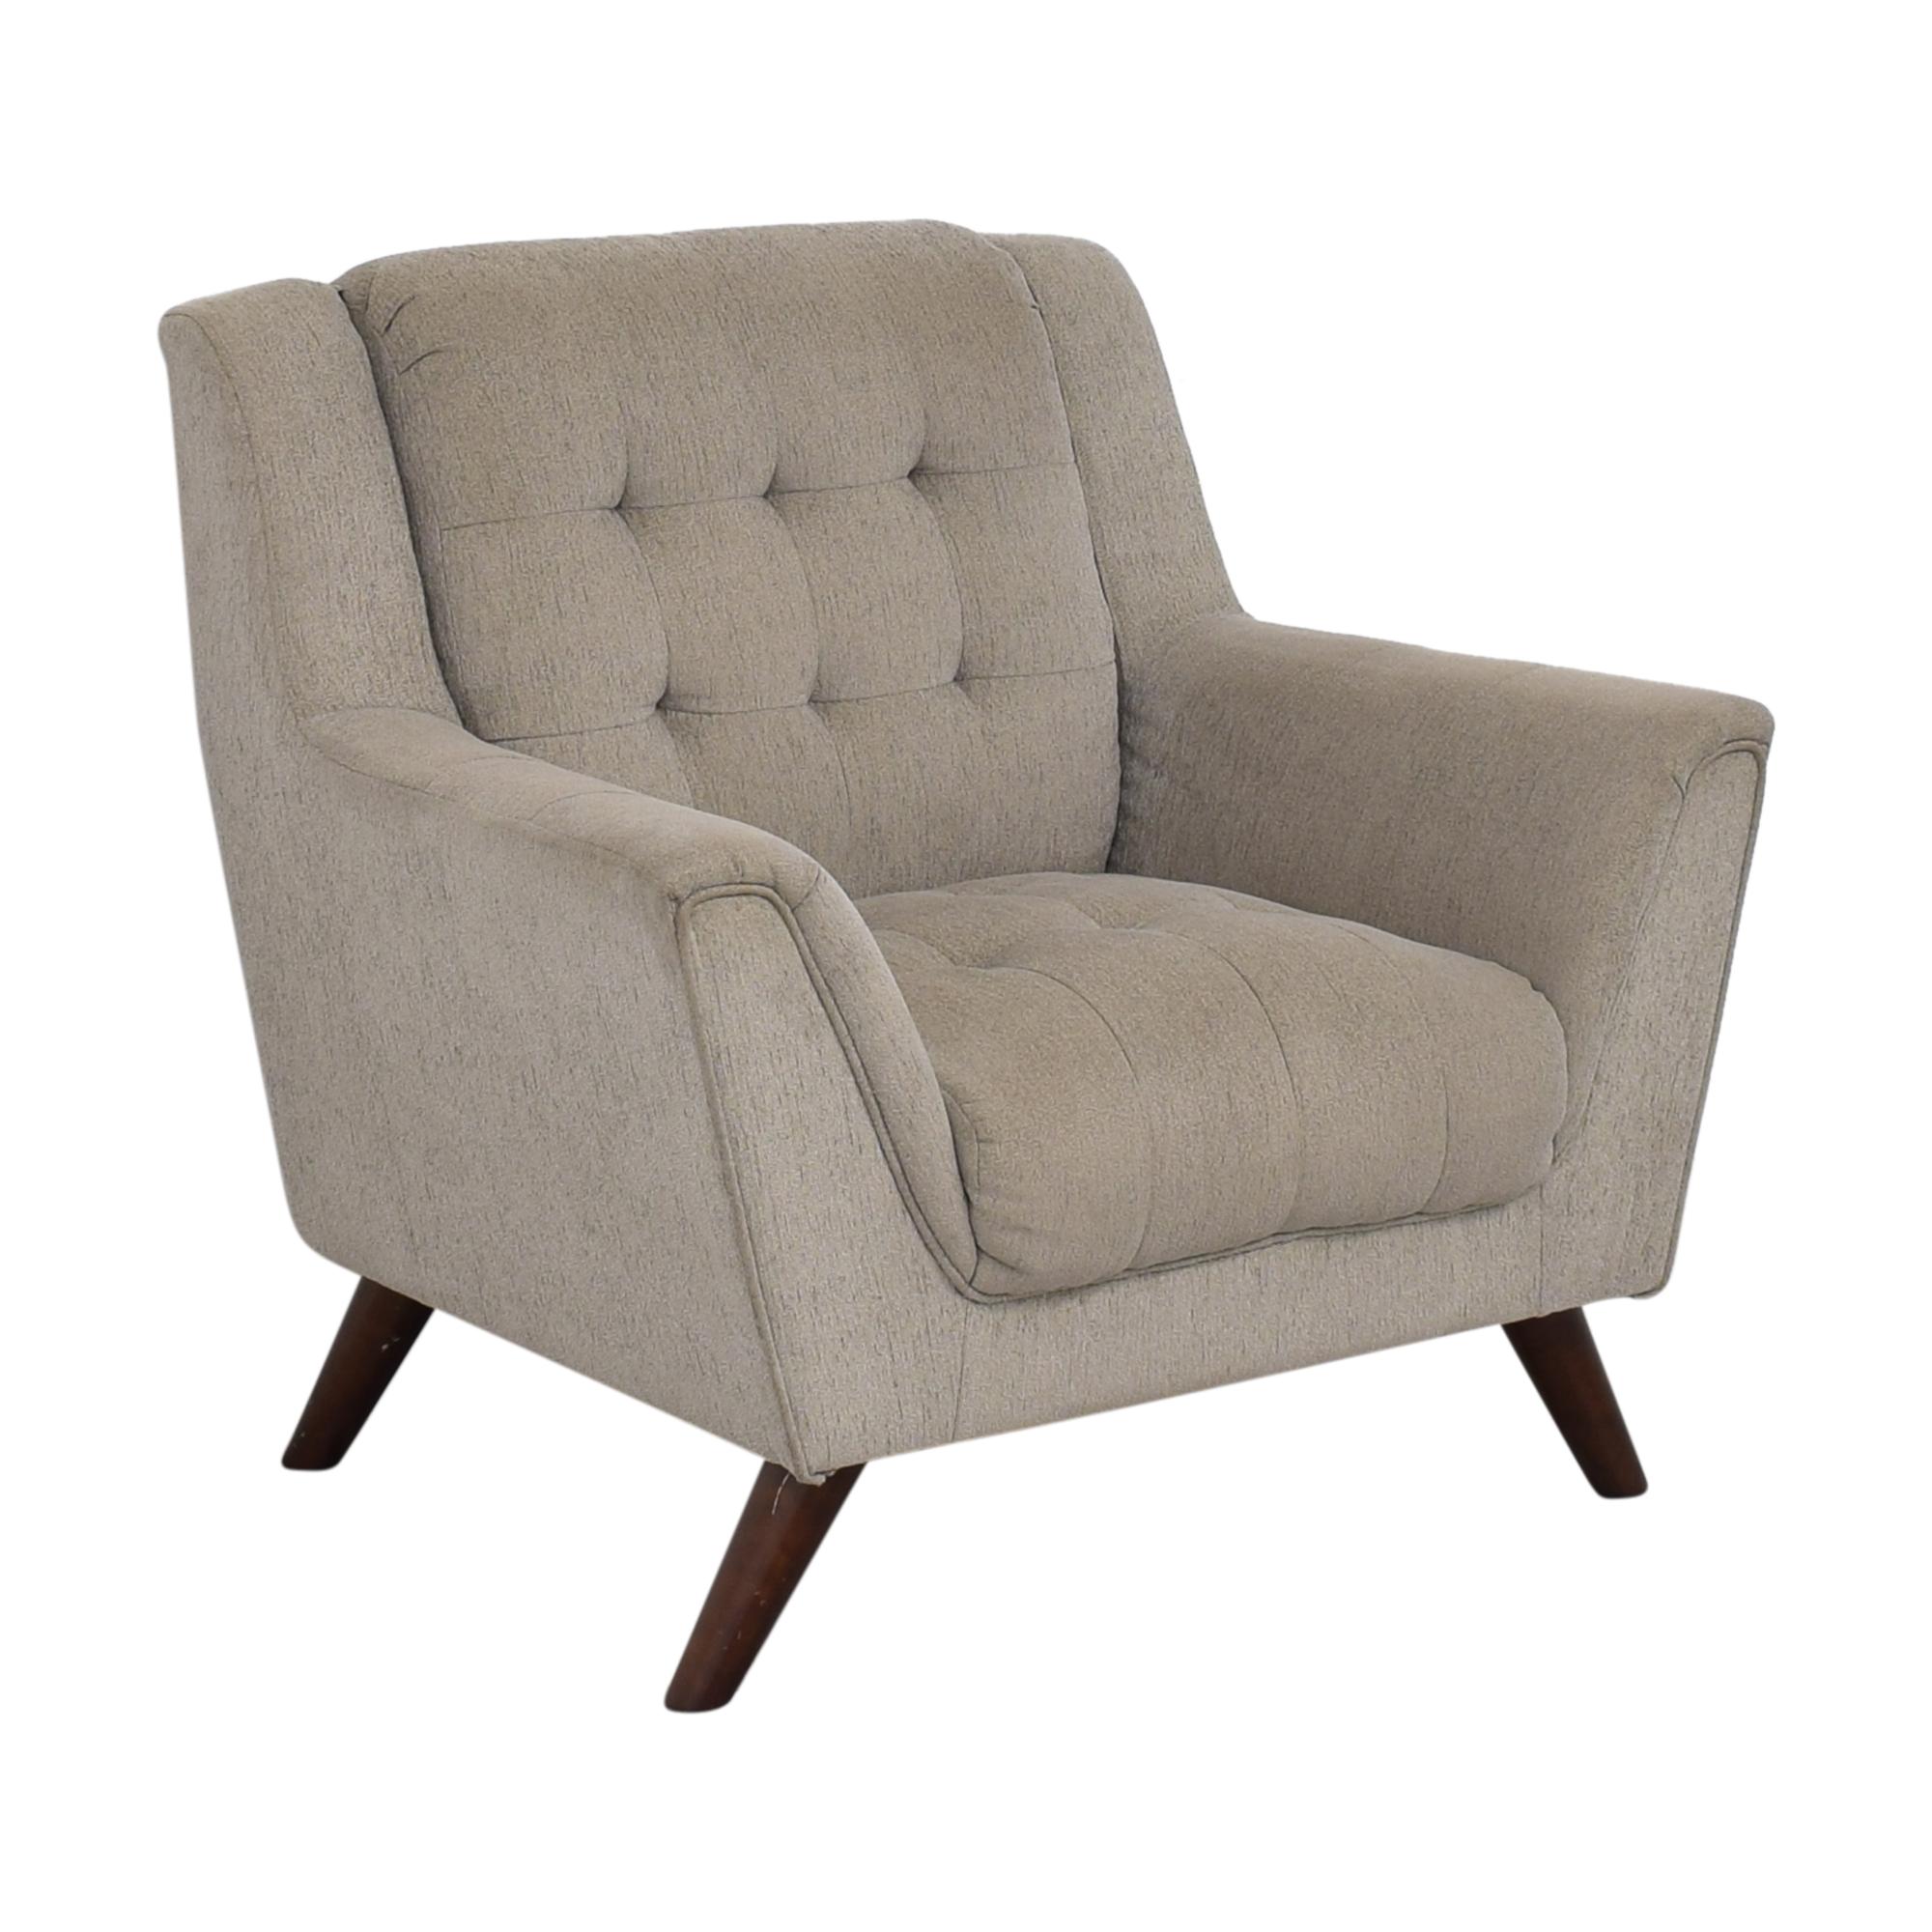 Coaster Fine Furniture Coaster Baby Natalia Chair